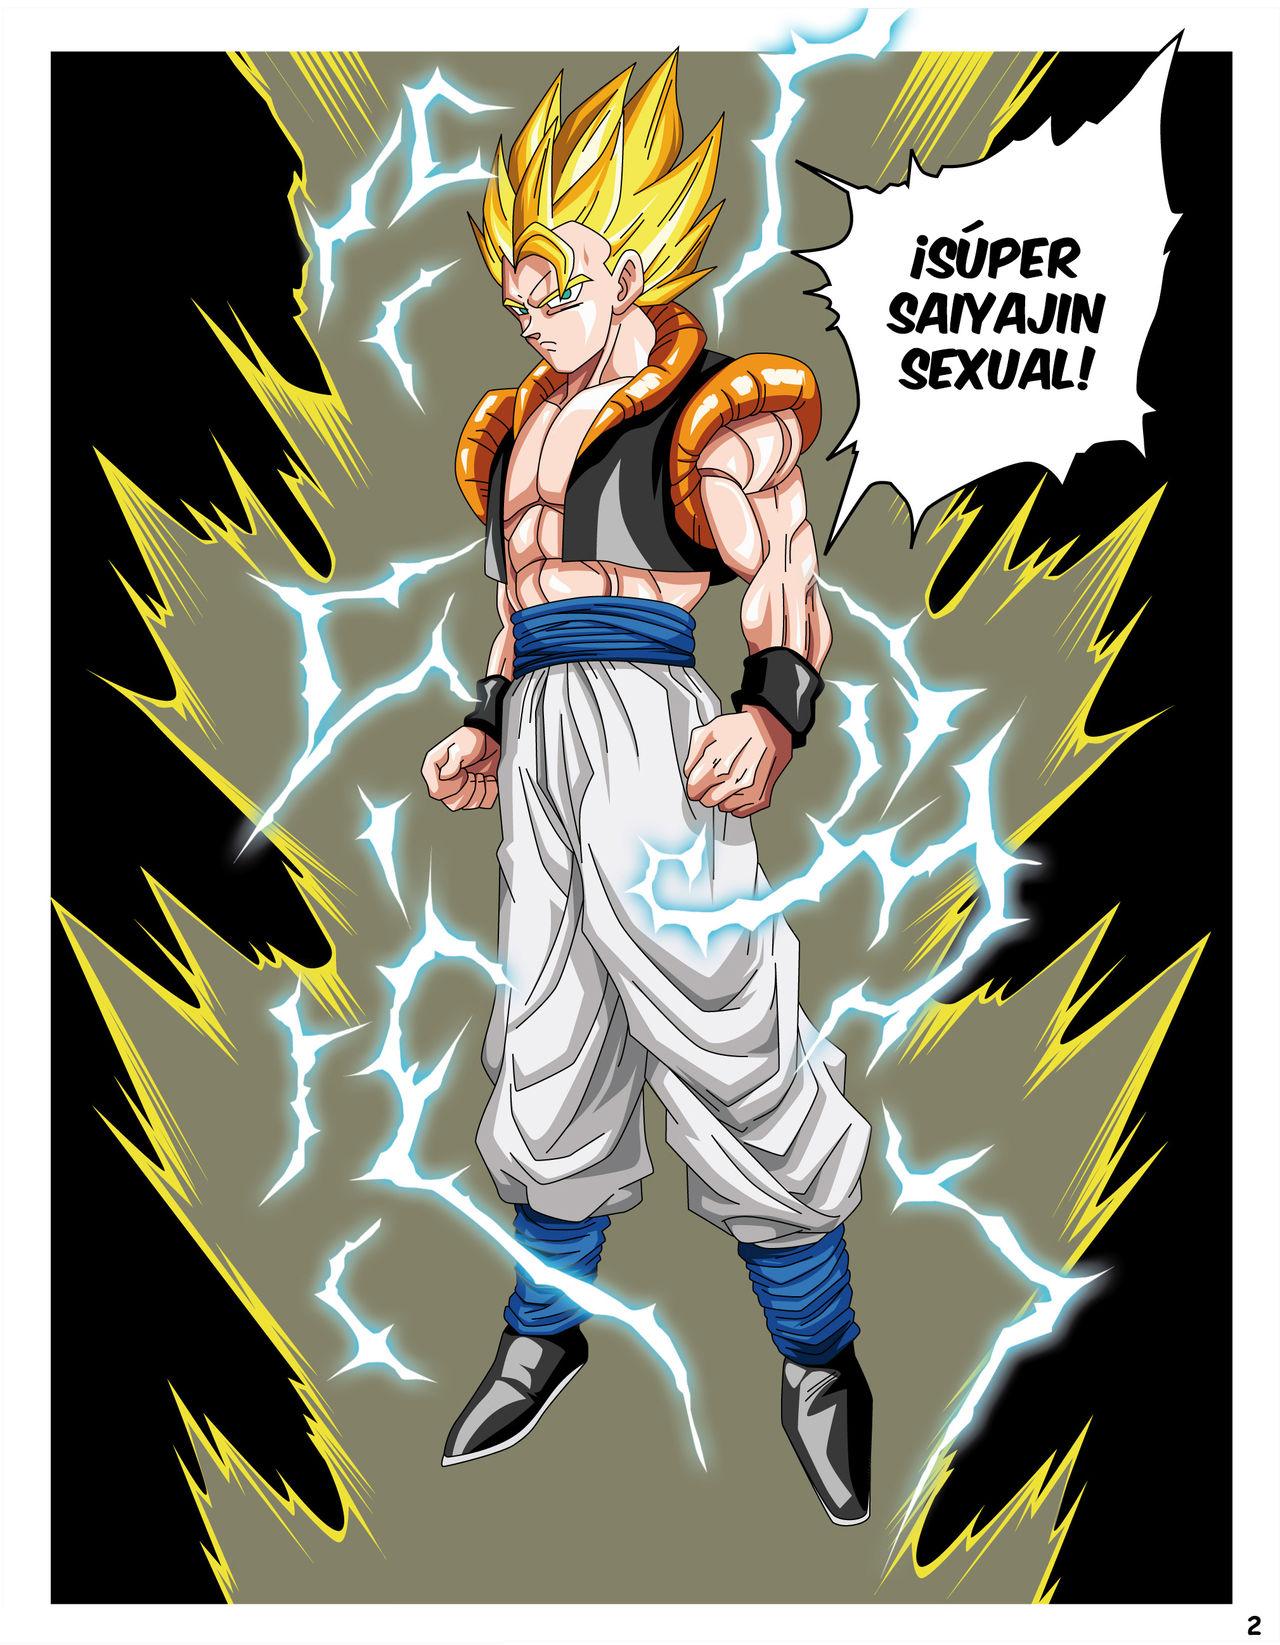 DRAGON BALL H - Super Saiyajin SEXUAL